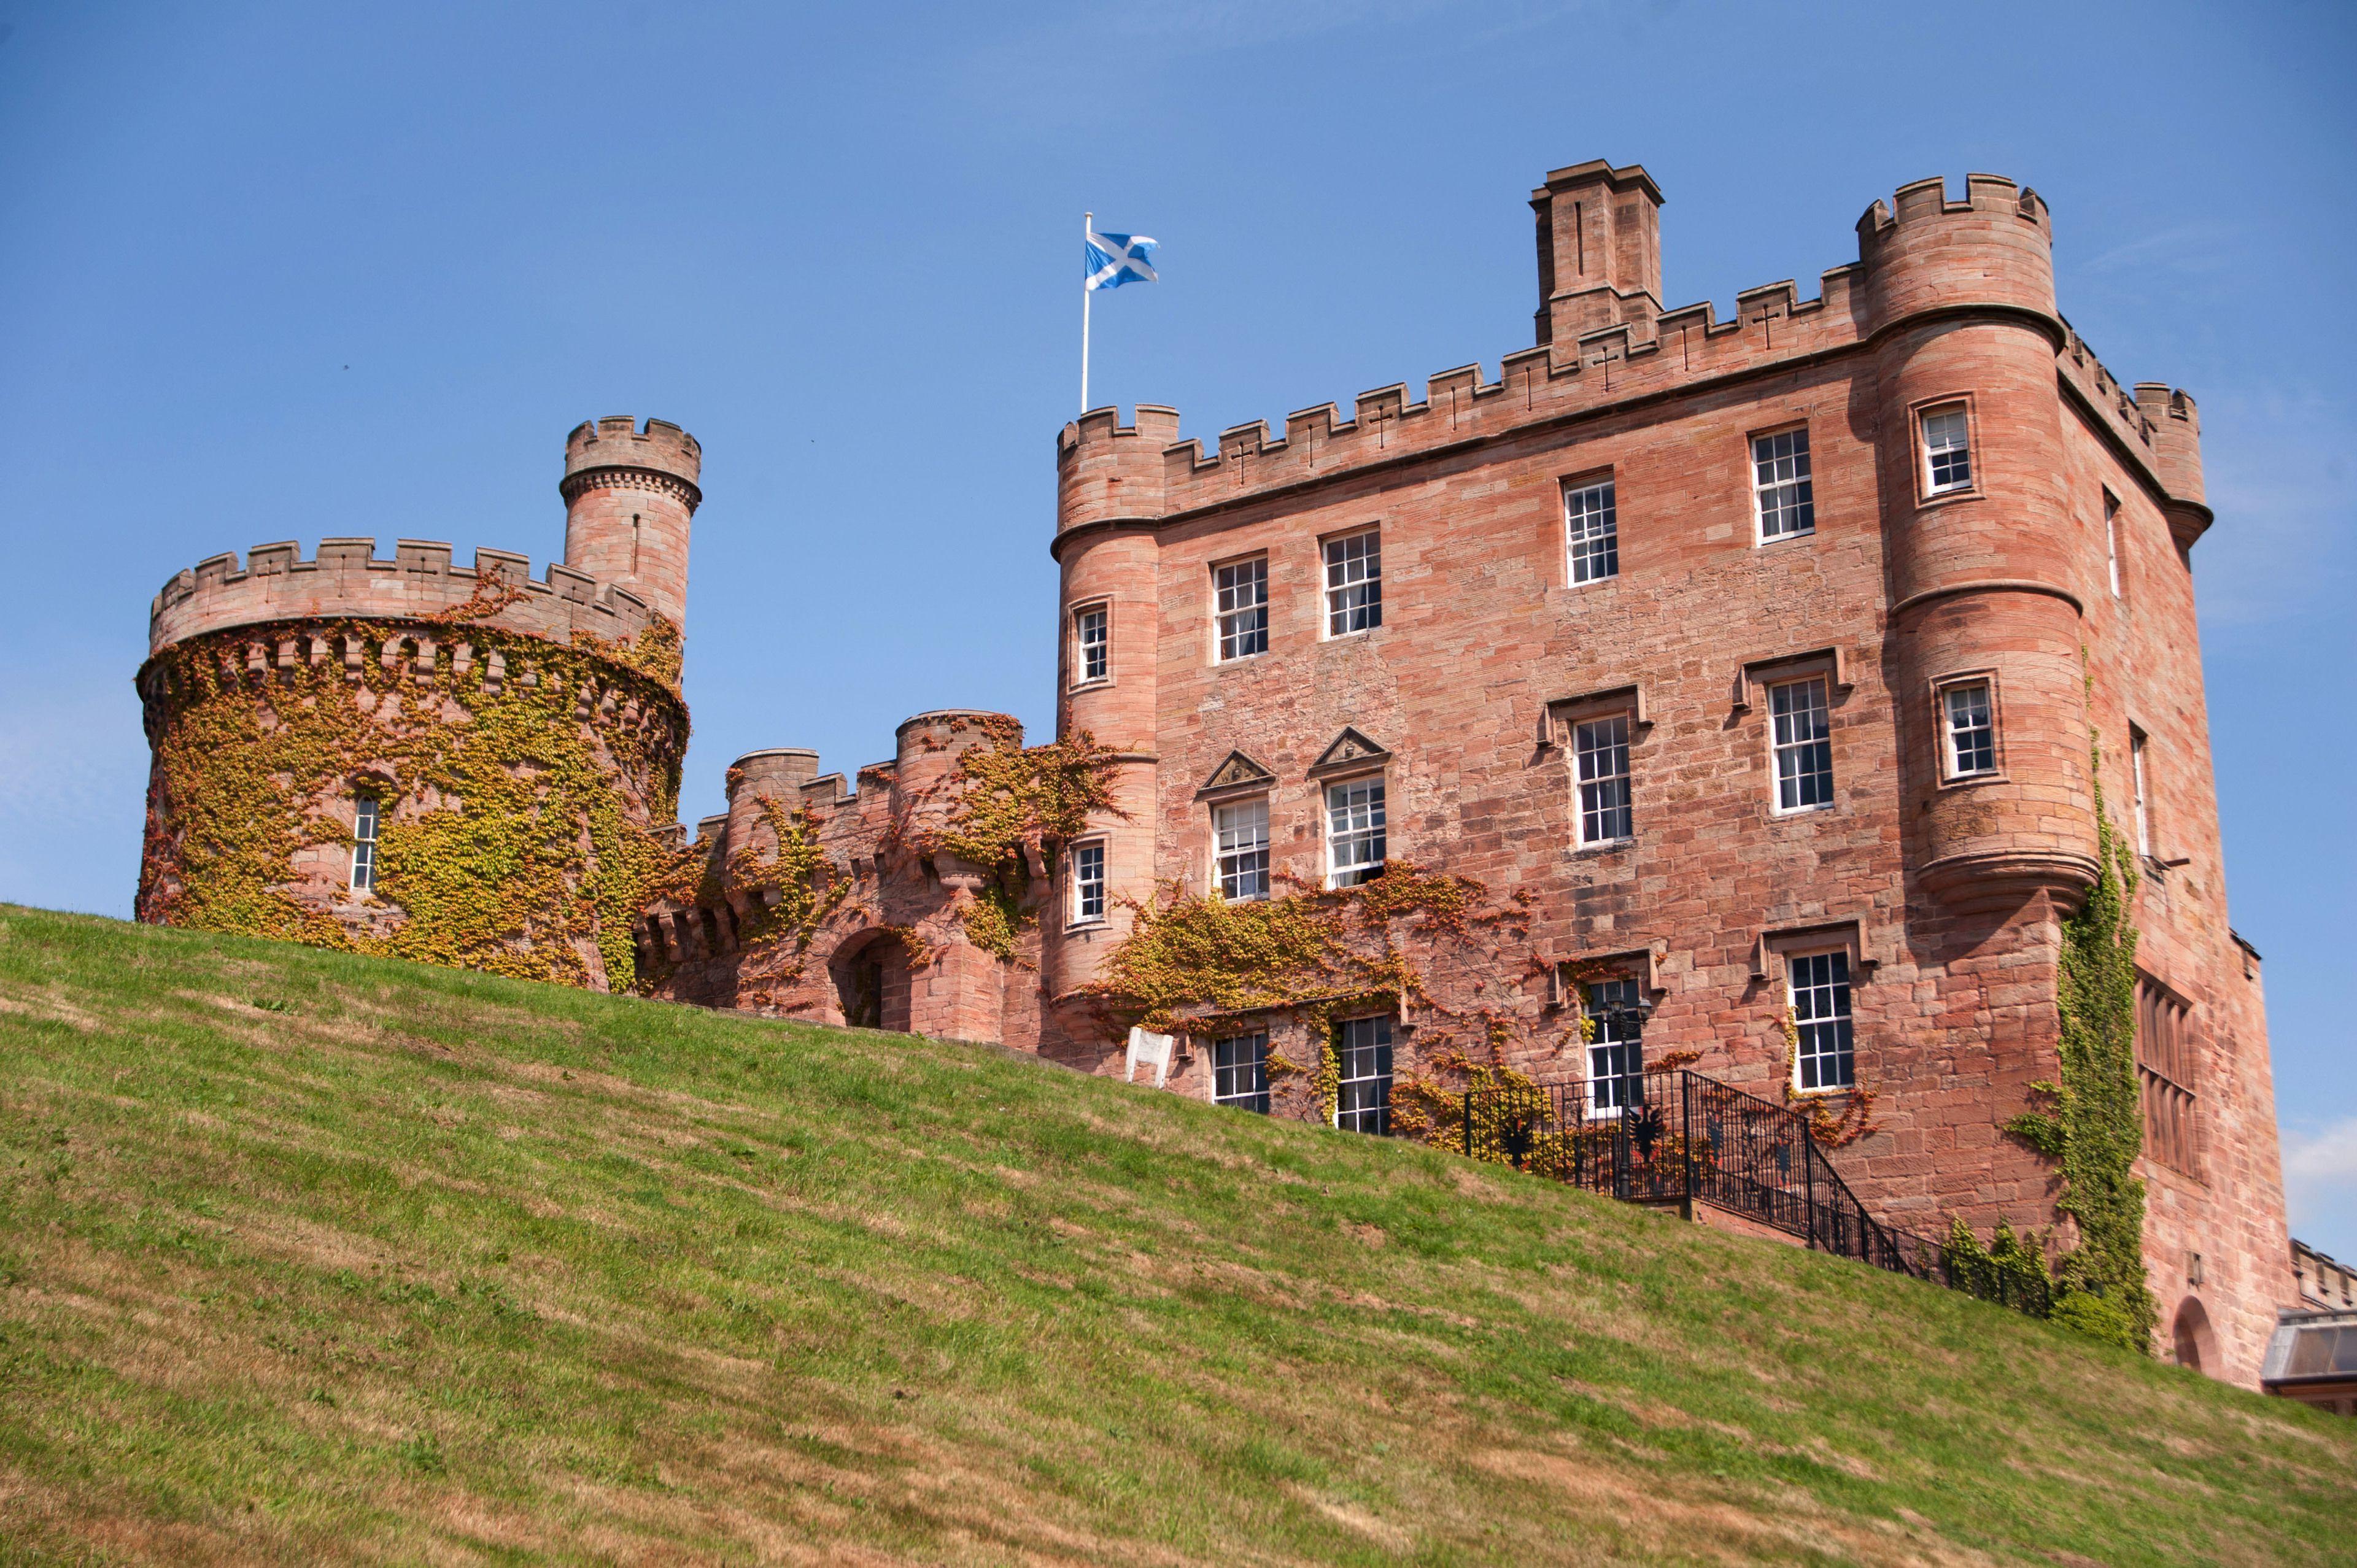 Courtesy of Dalhousie Castle / Expedia